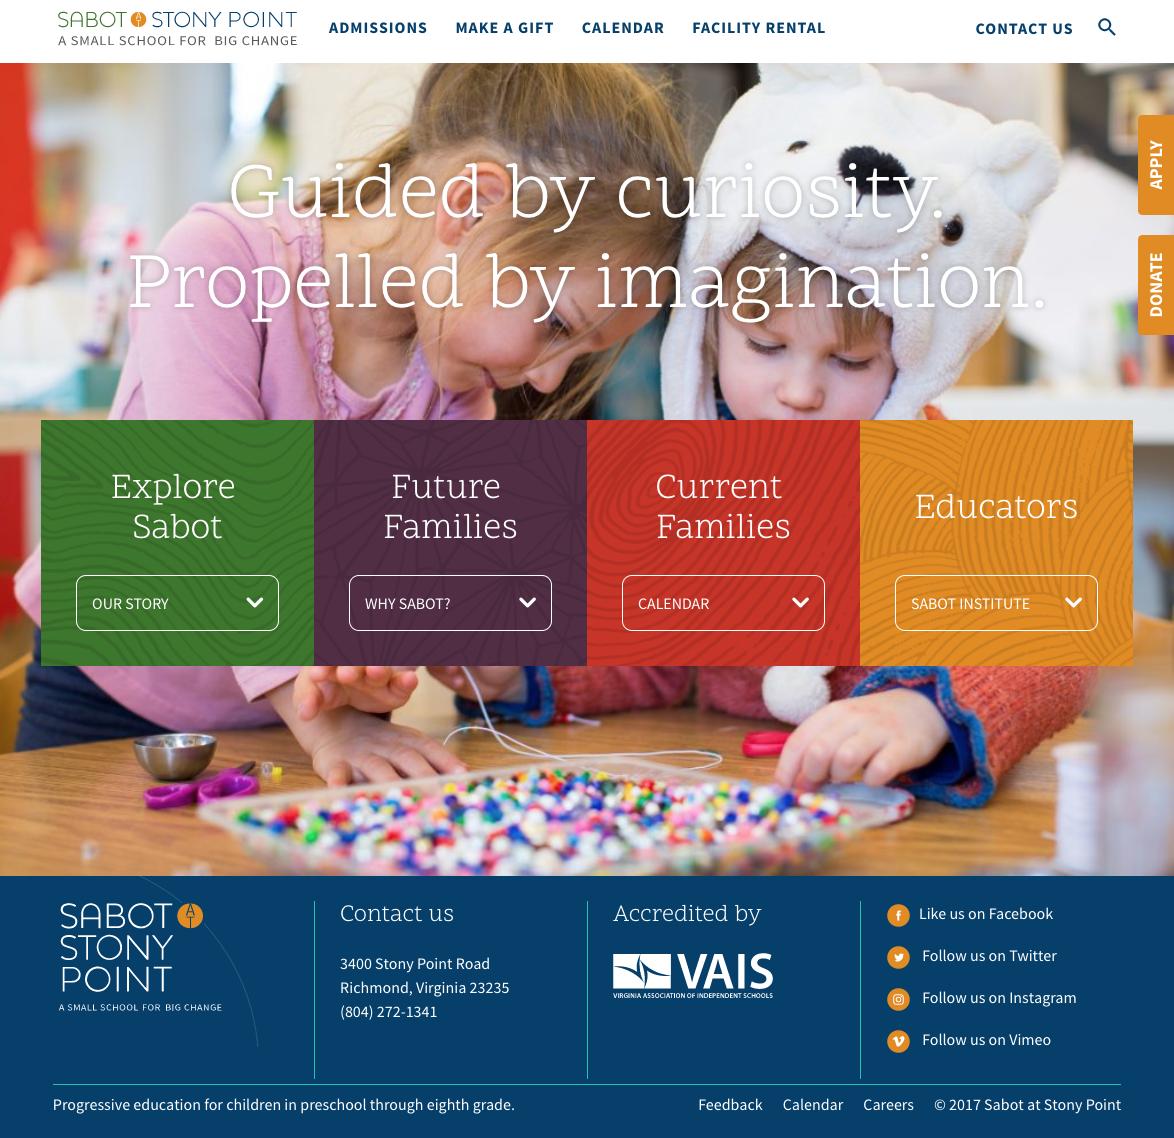 Website Design & Development for Sabot at Stony Point